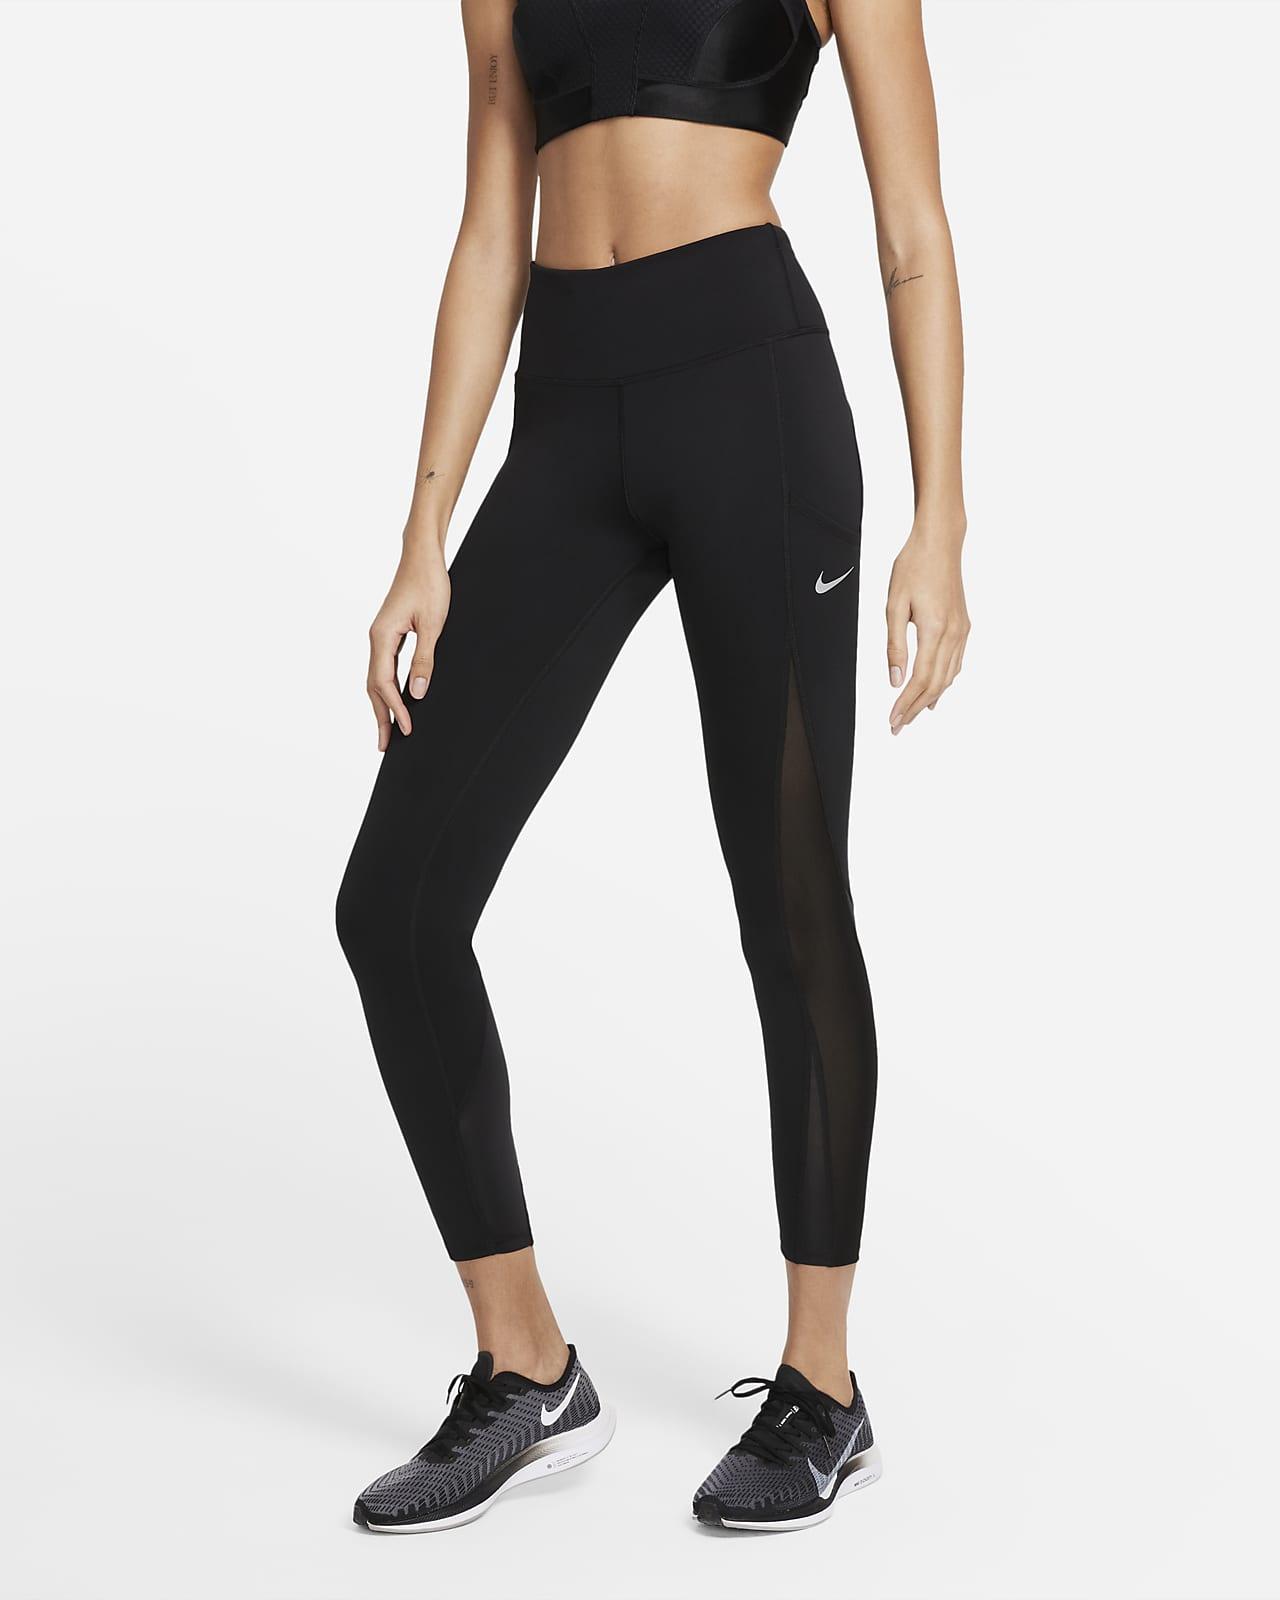 Nike Epic Luxe Cool Women's Mid-Rise 7/8 Running Leggings